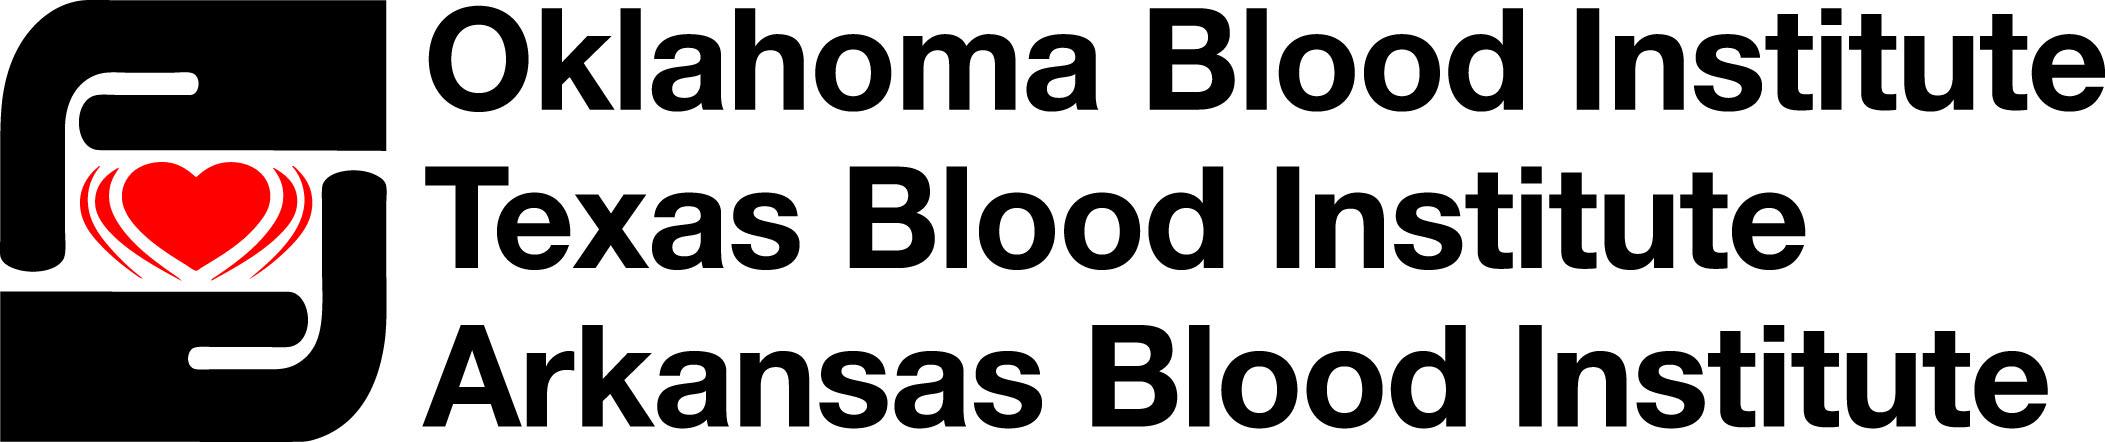 Oklahoma Blood Institute logo